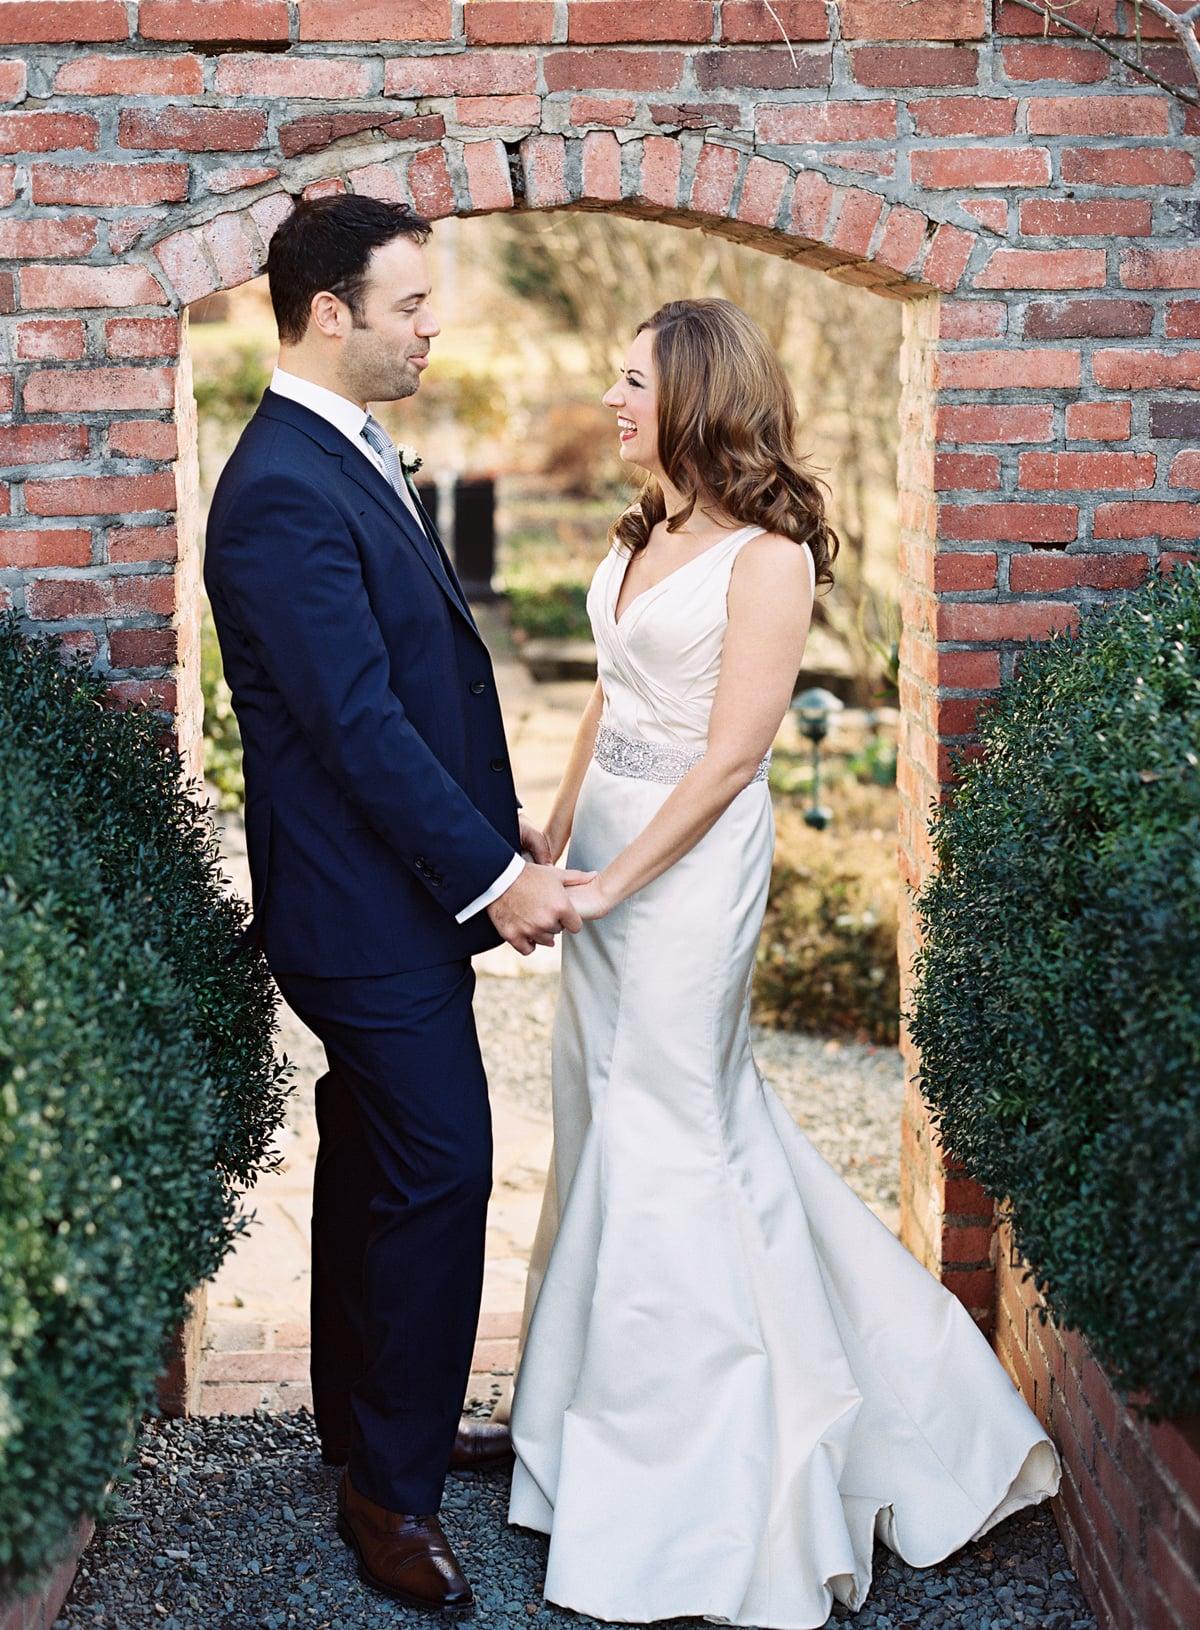 clifton-inn-wedding-027.jpg